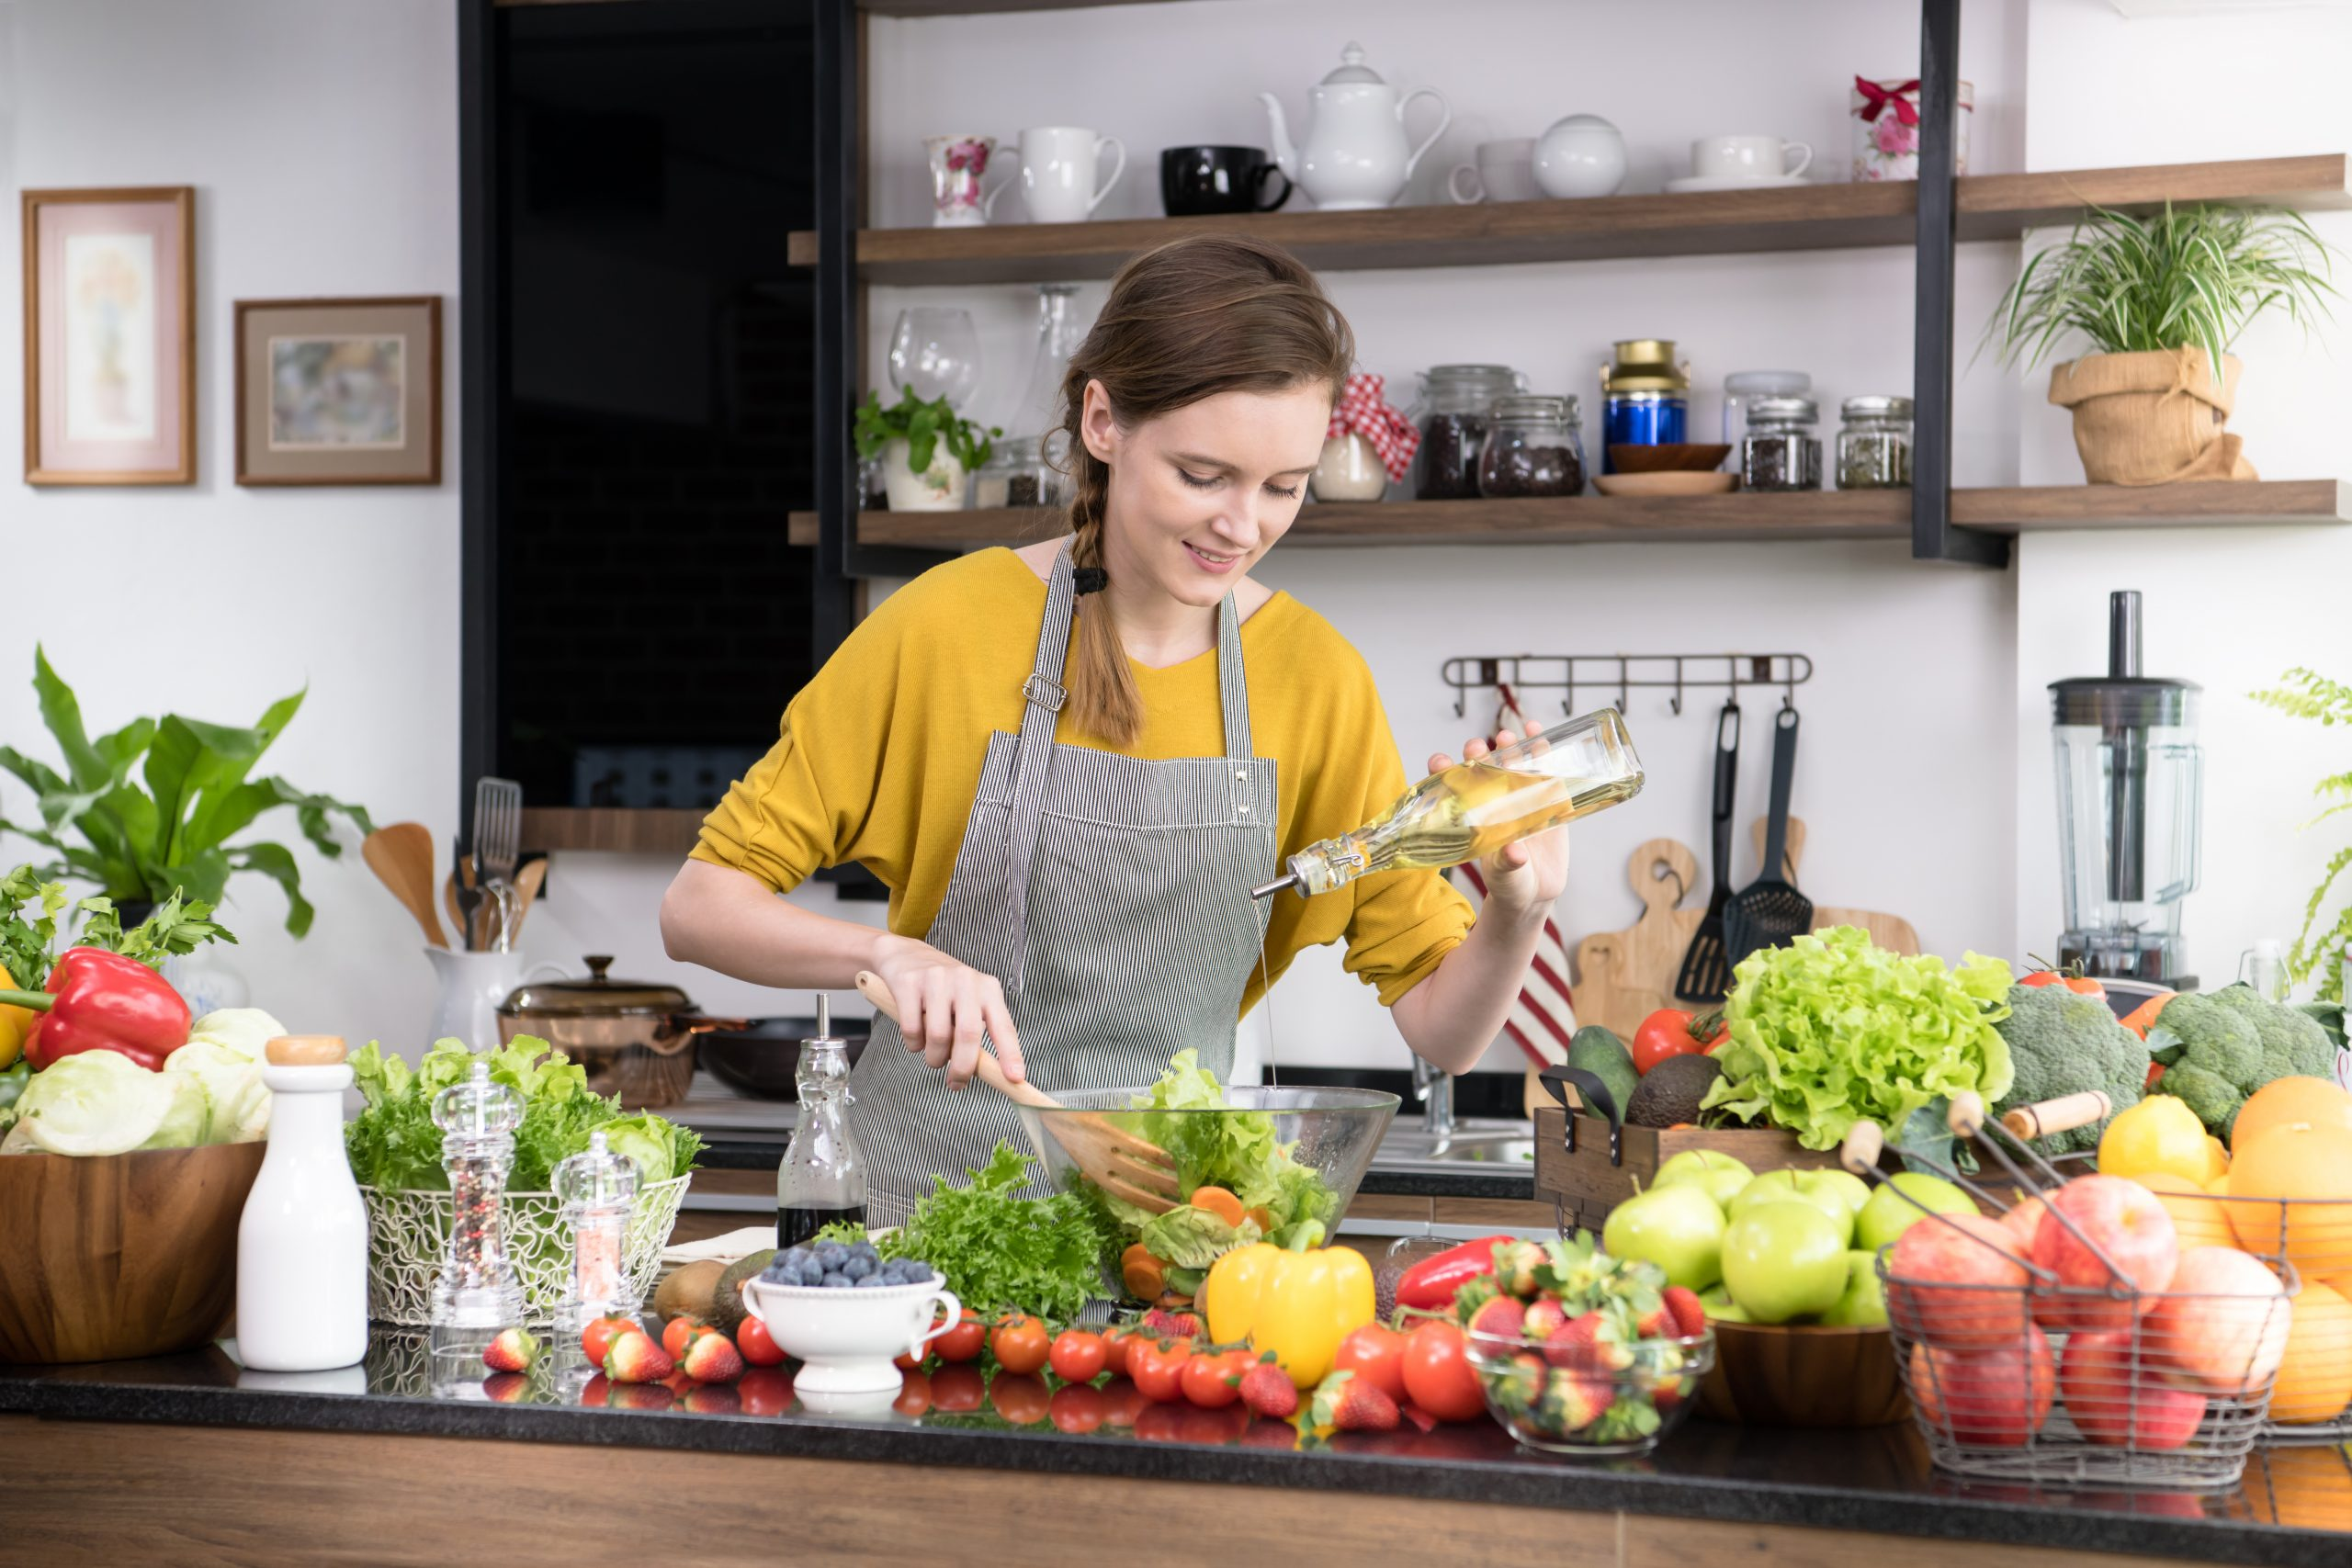 Module 4 – High Phytonutrient Food Plan